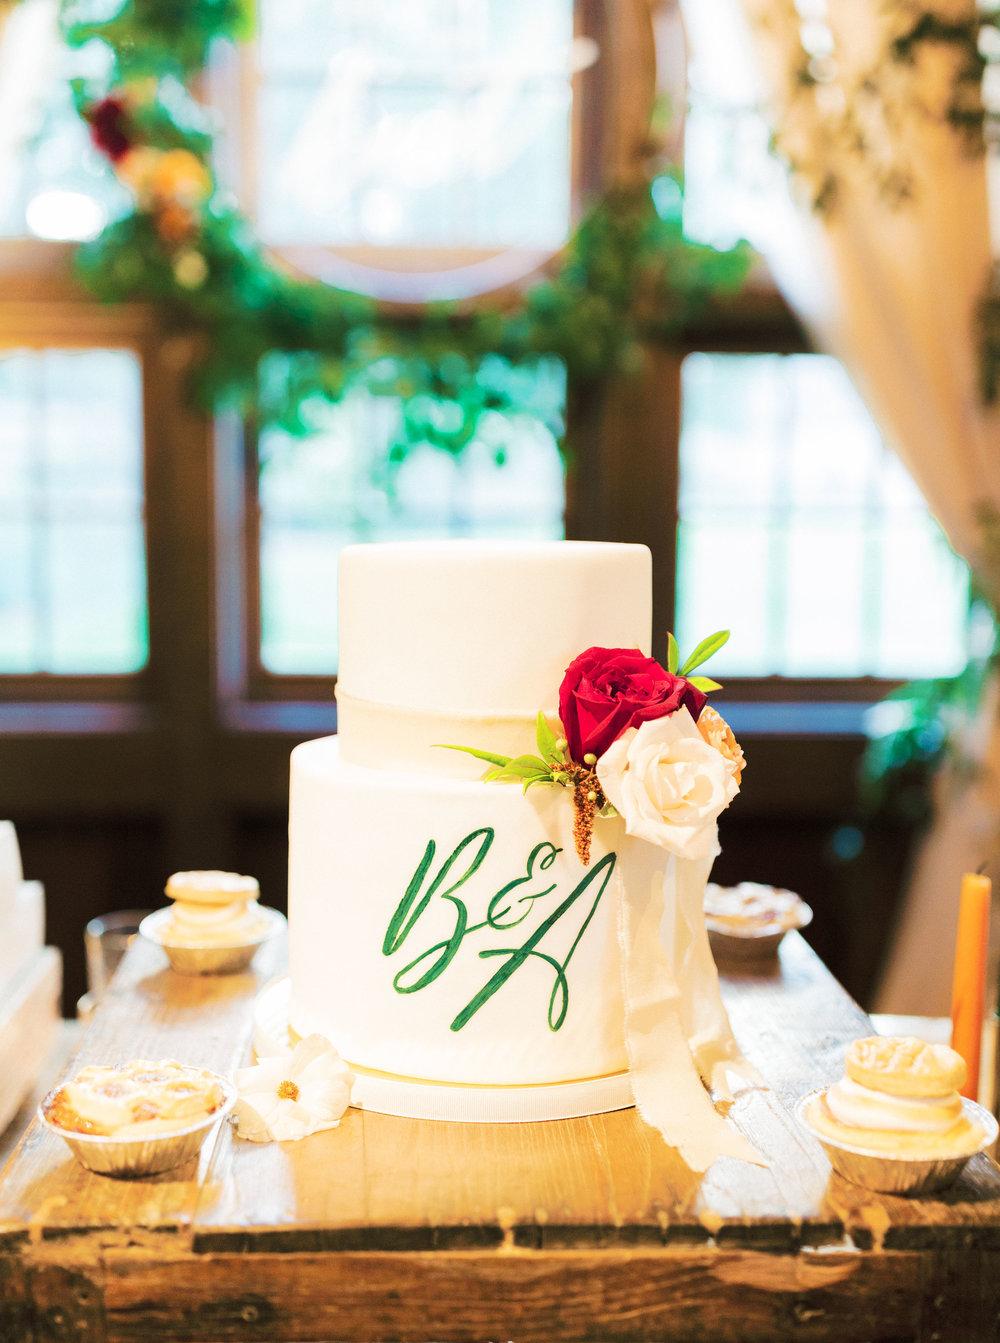 92. Cake + Monogram.jpg